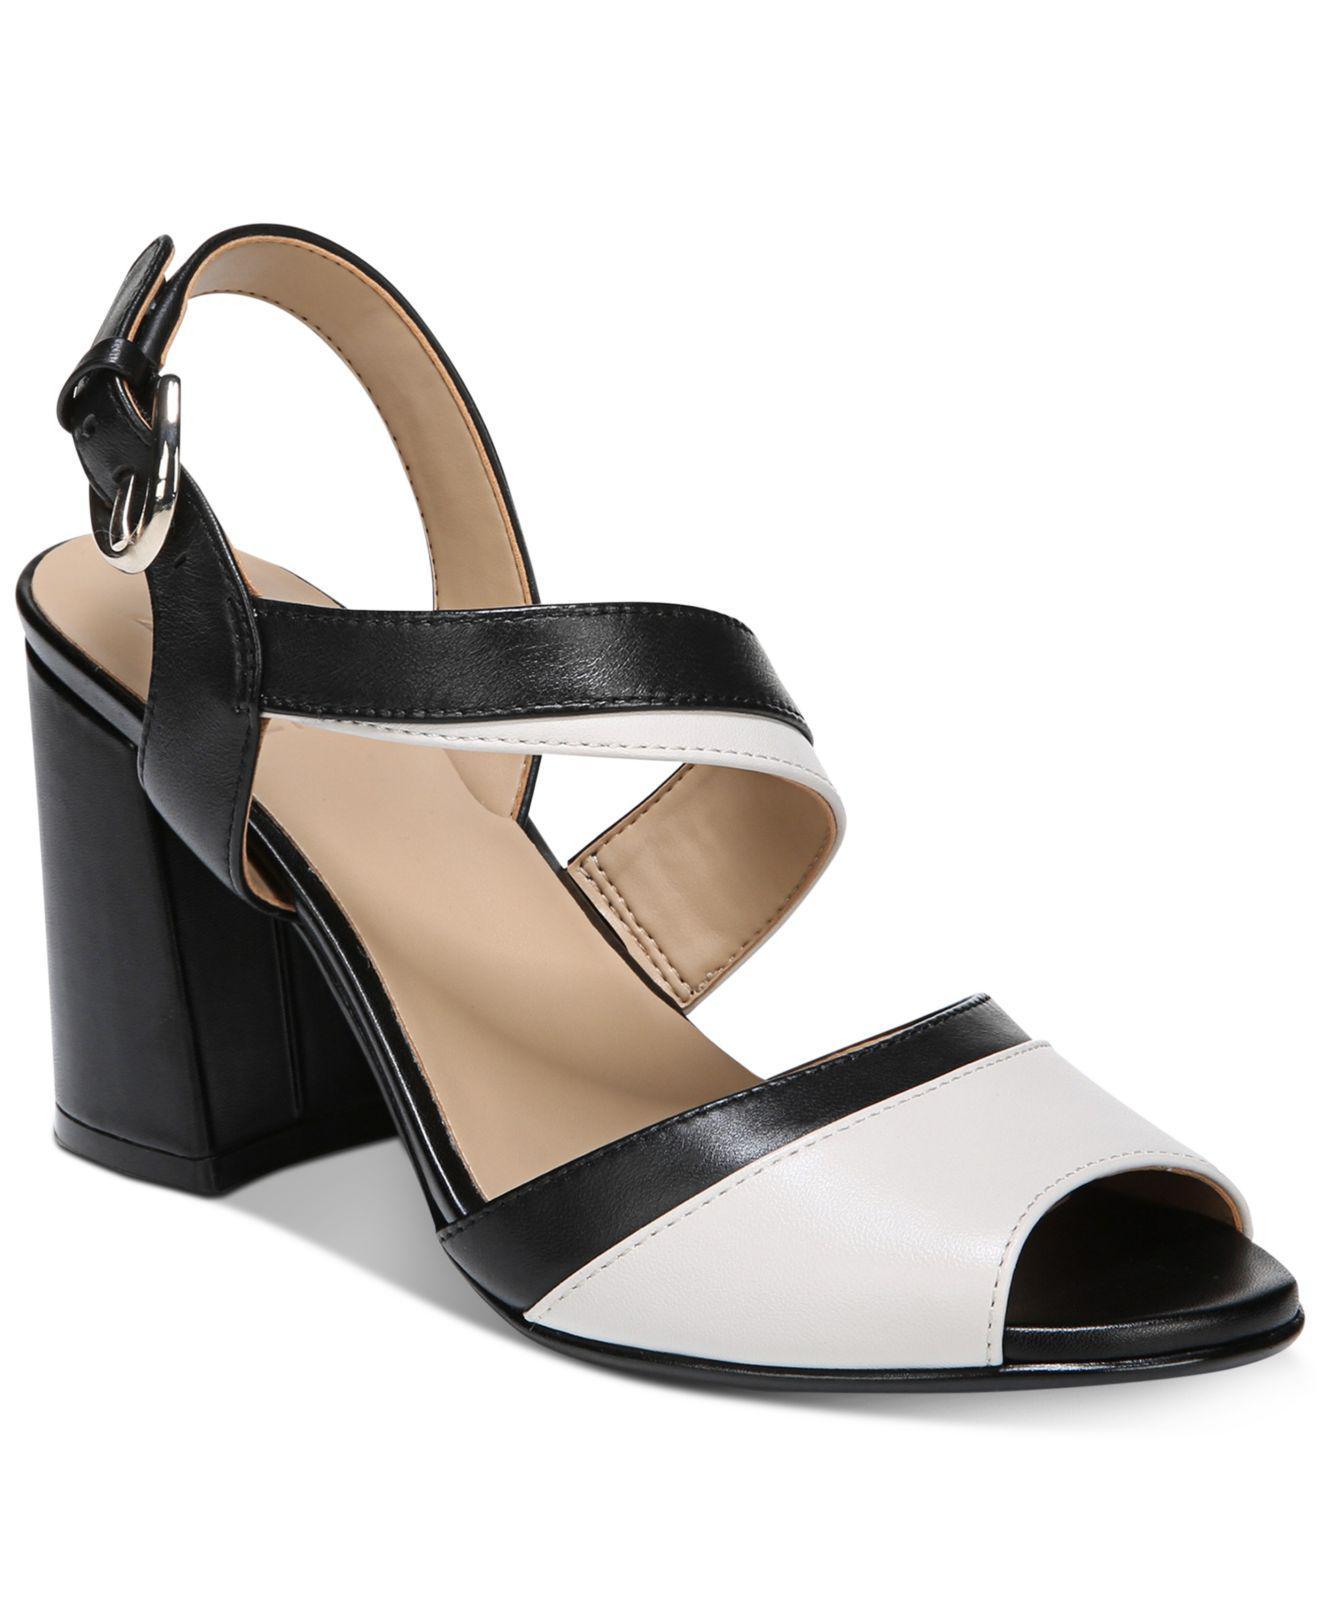 Terah Dress Sandals 0REDzNr